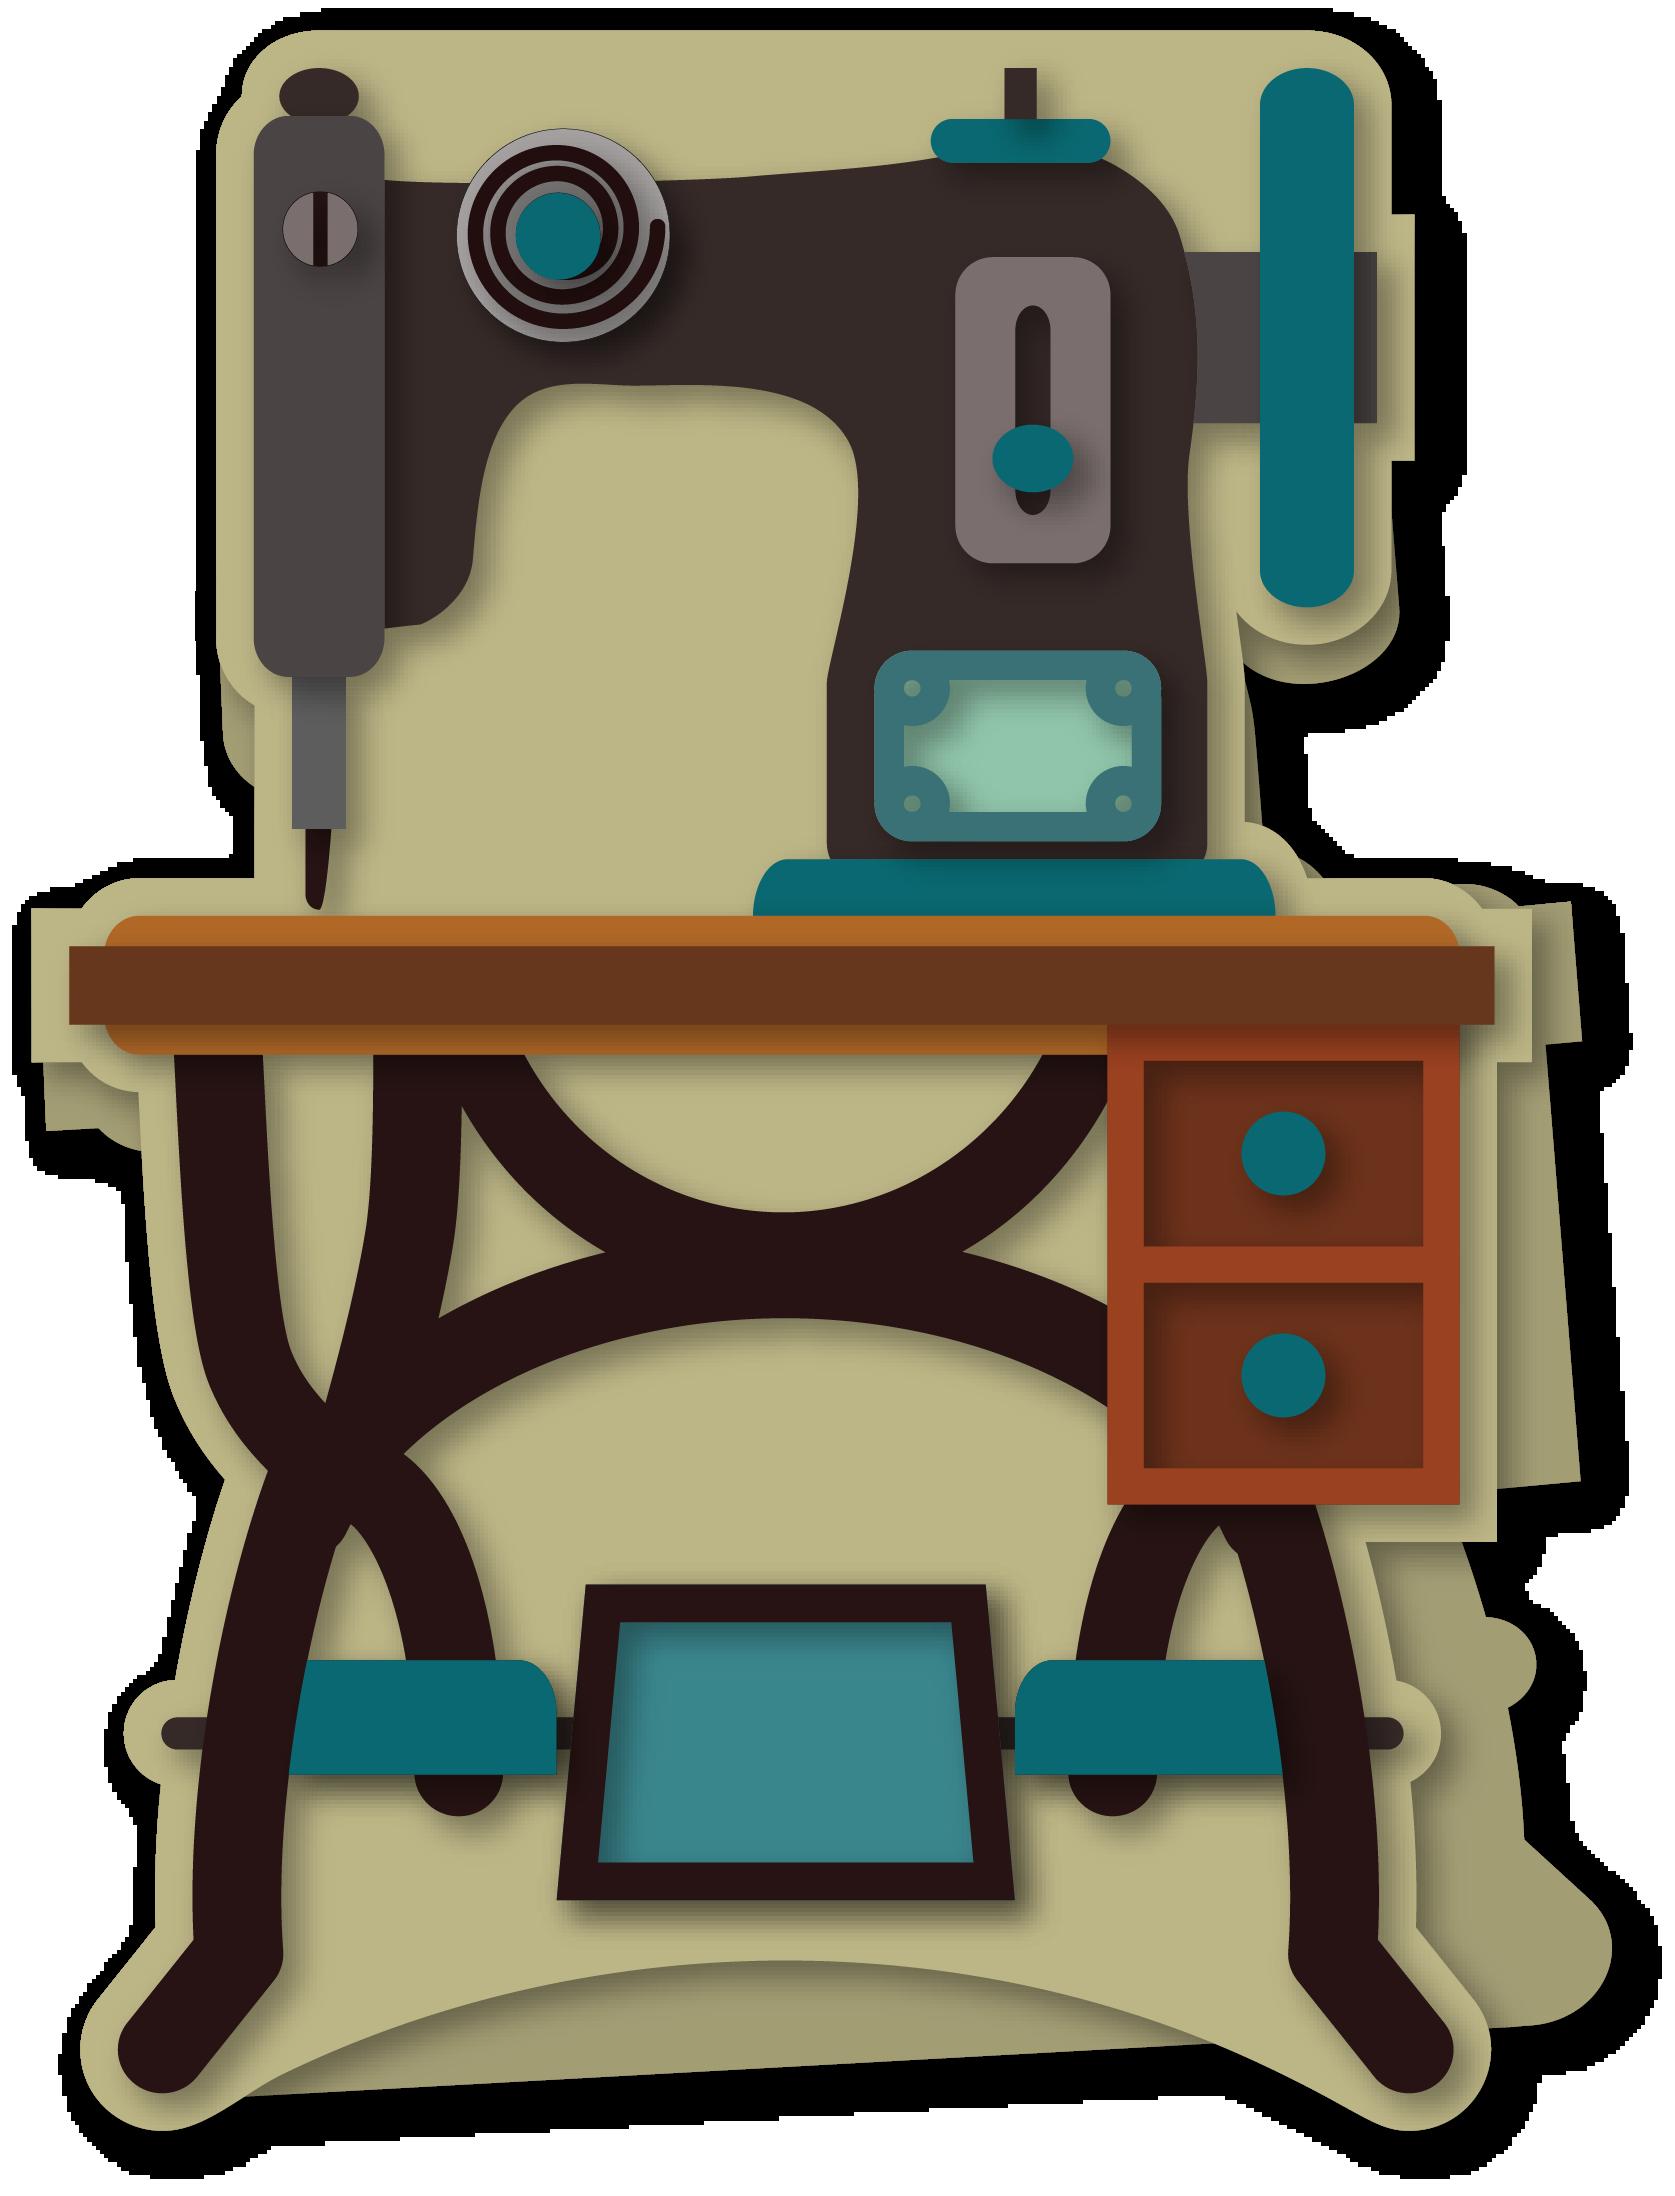 Sewing clipart sewing box. Treadle machine a card